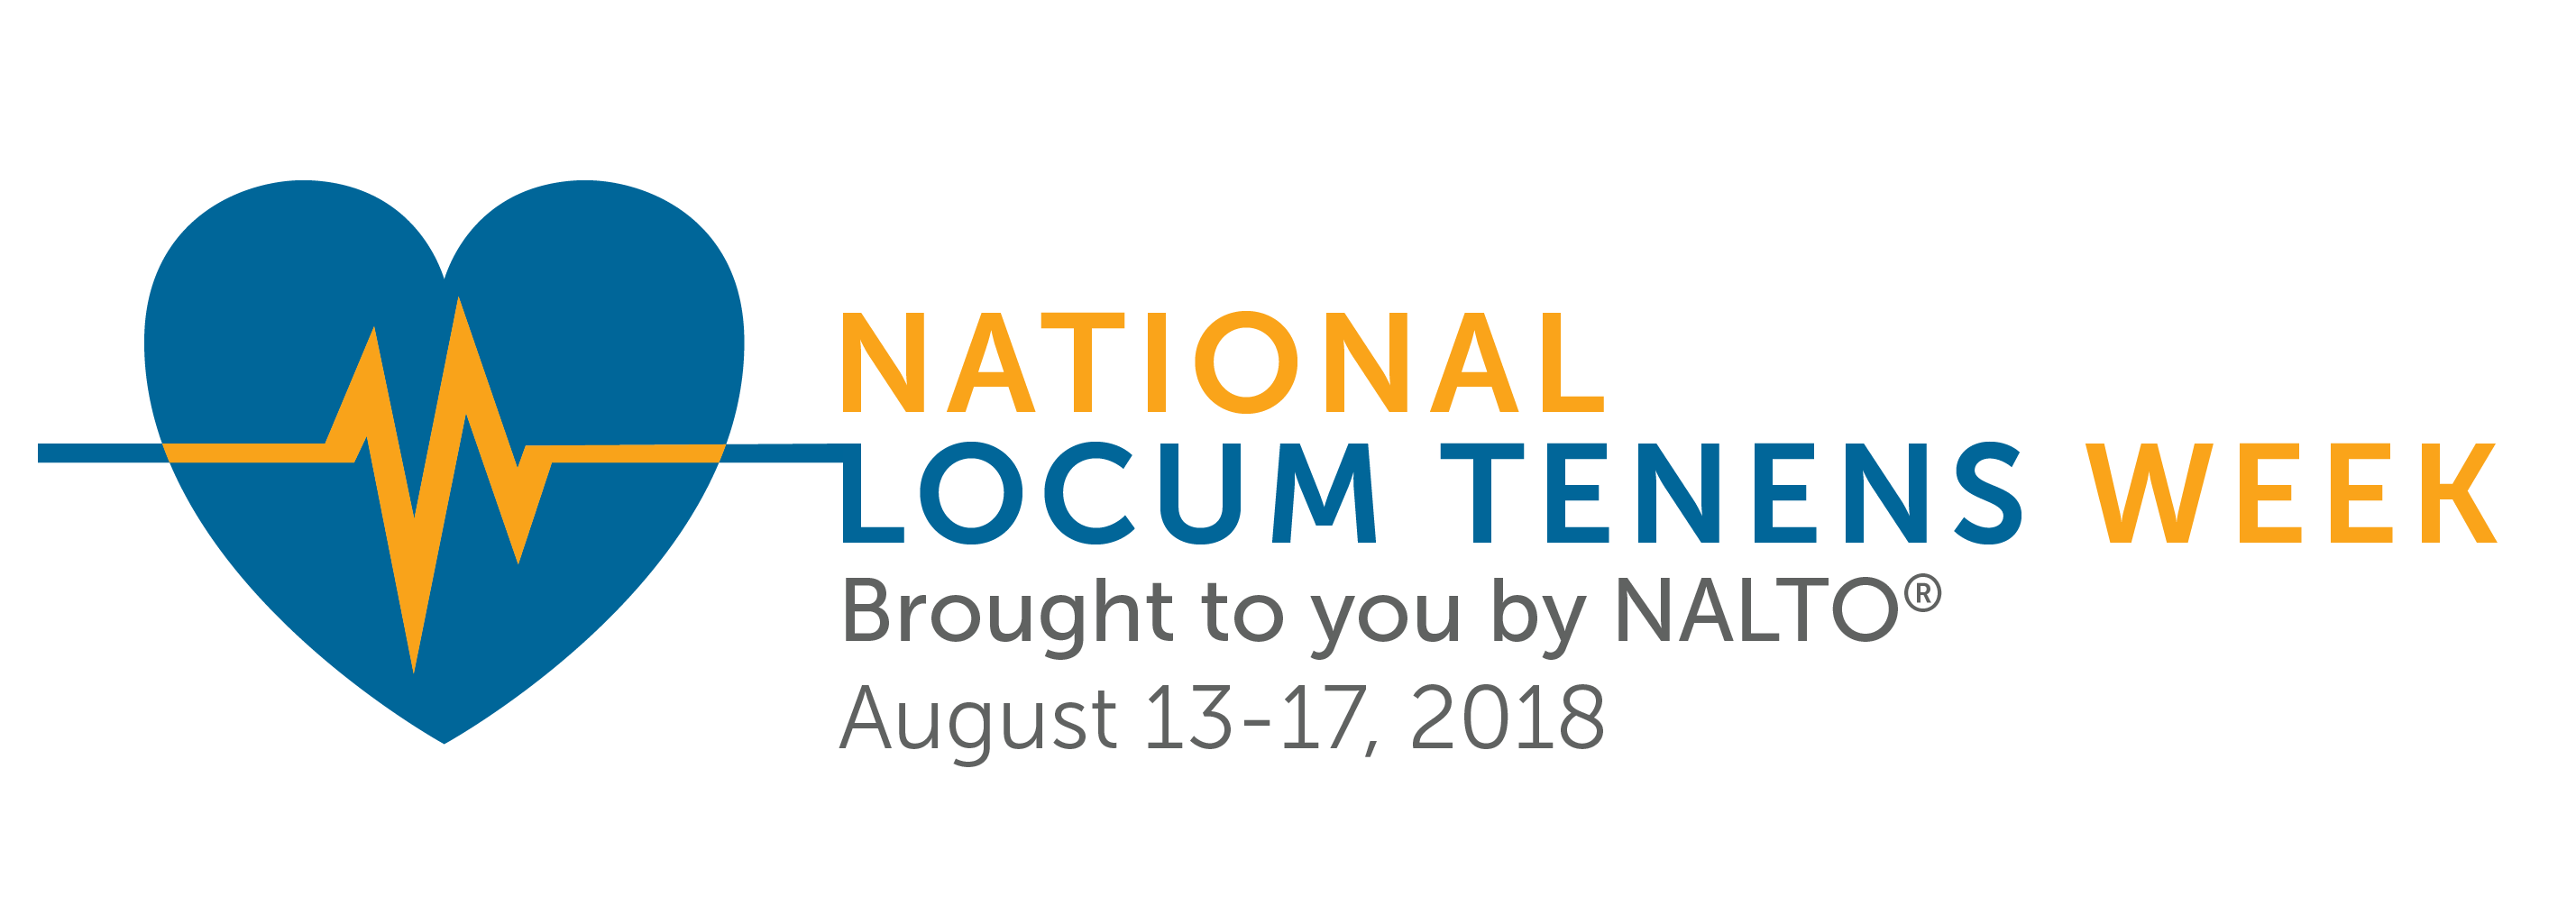 2018 National Locum Tenens Week